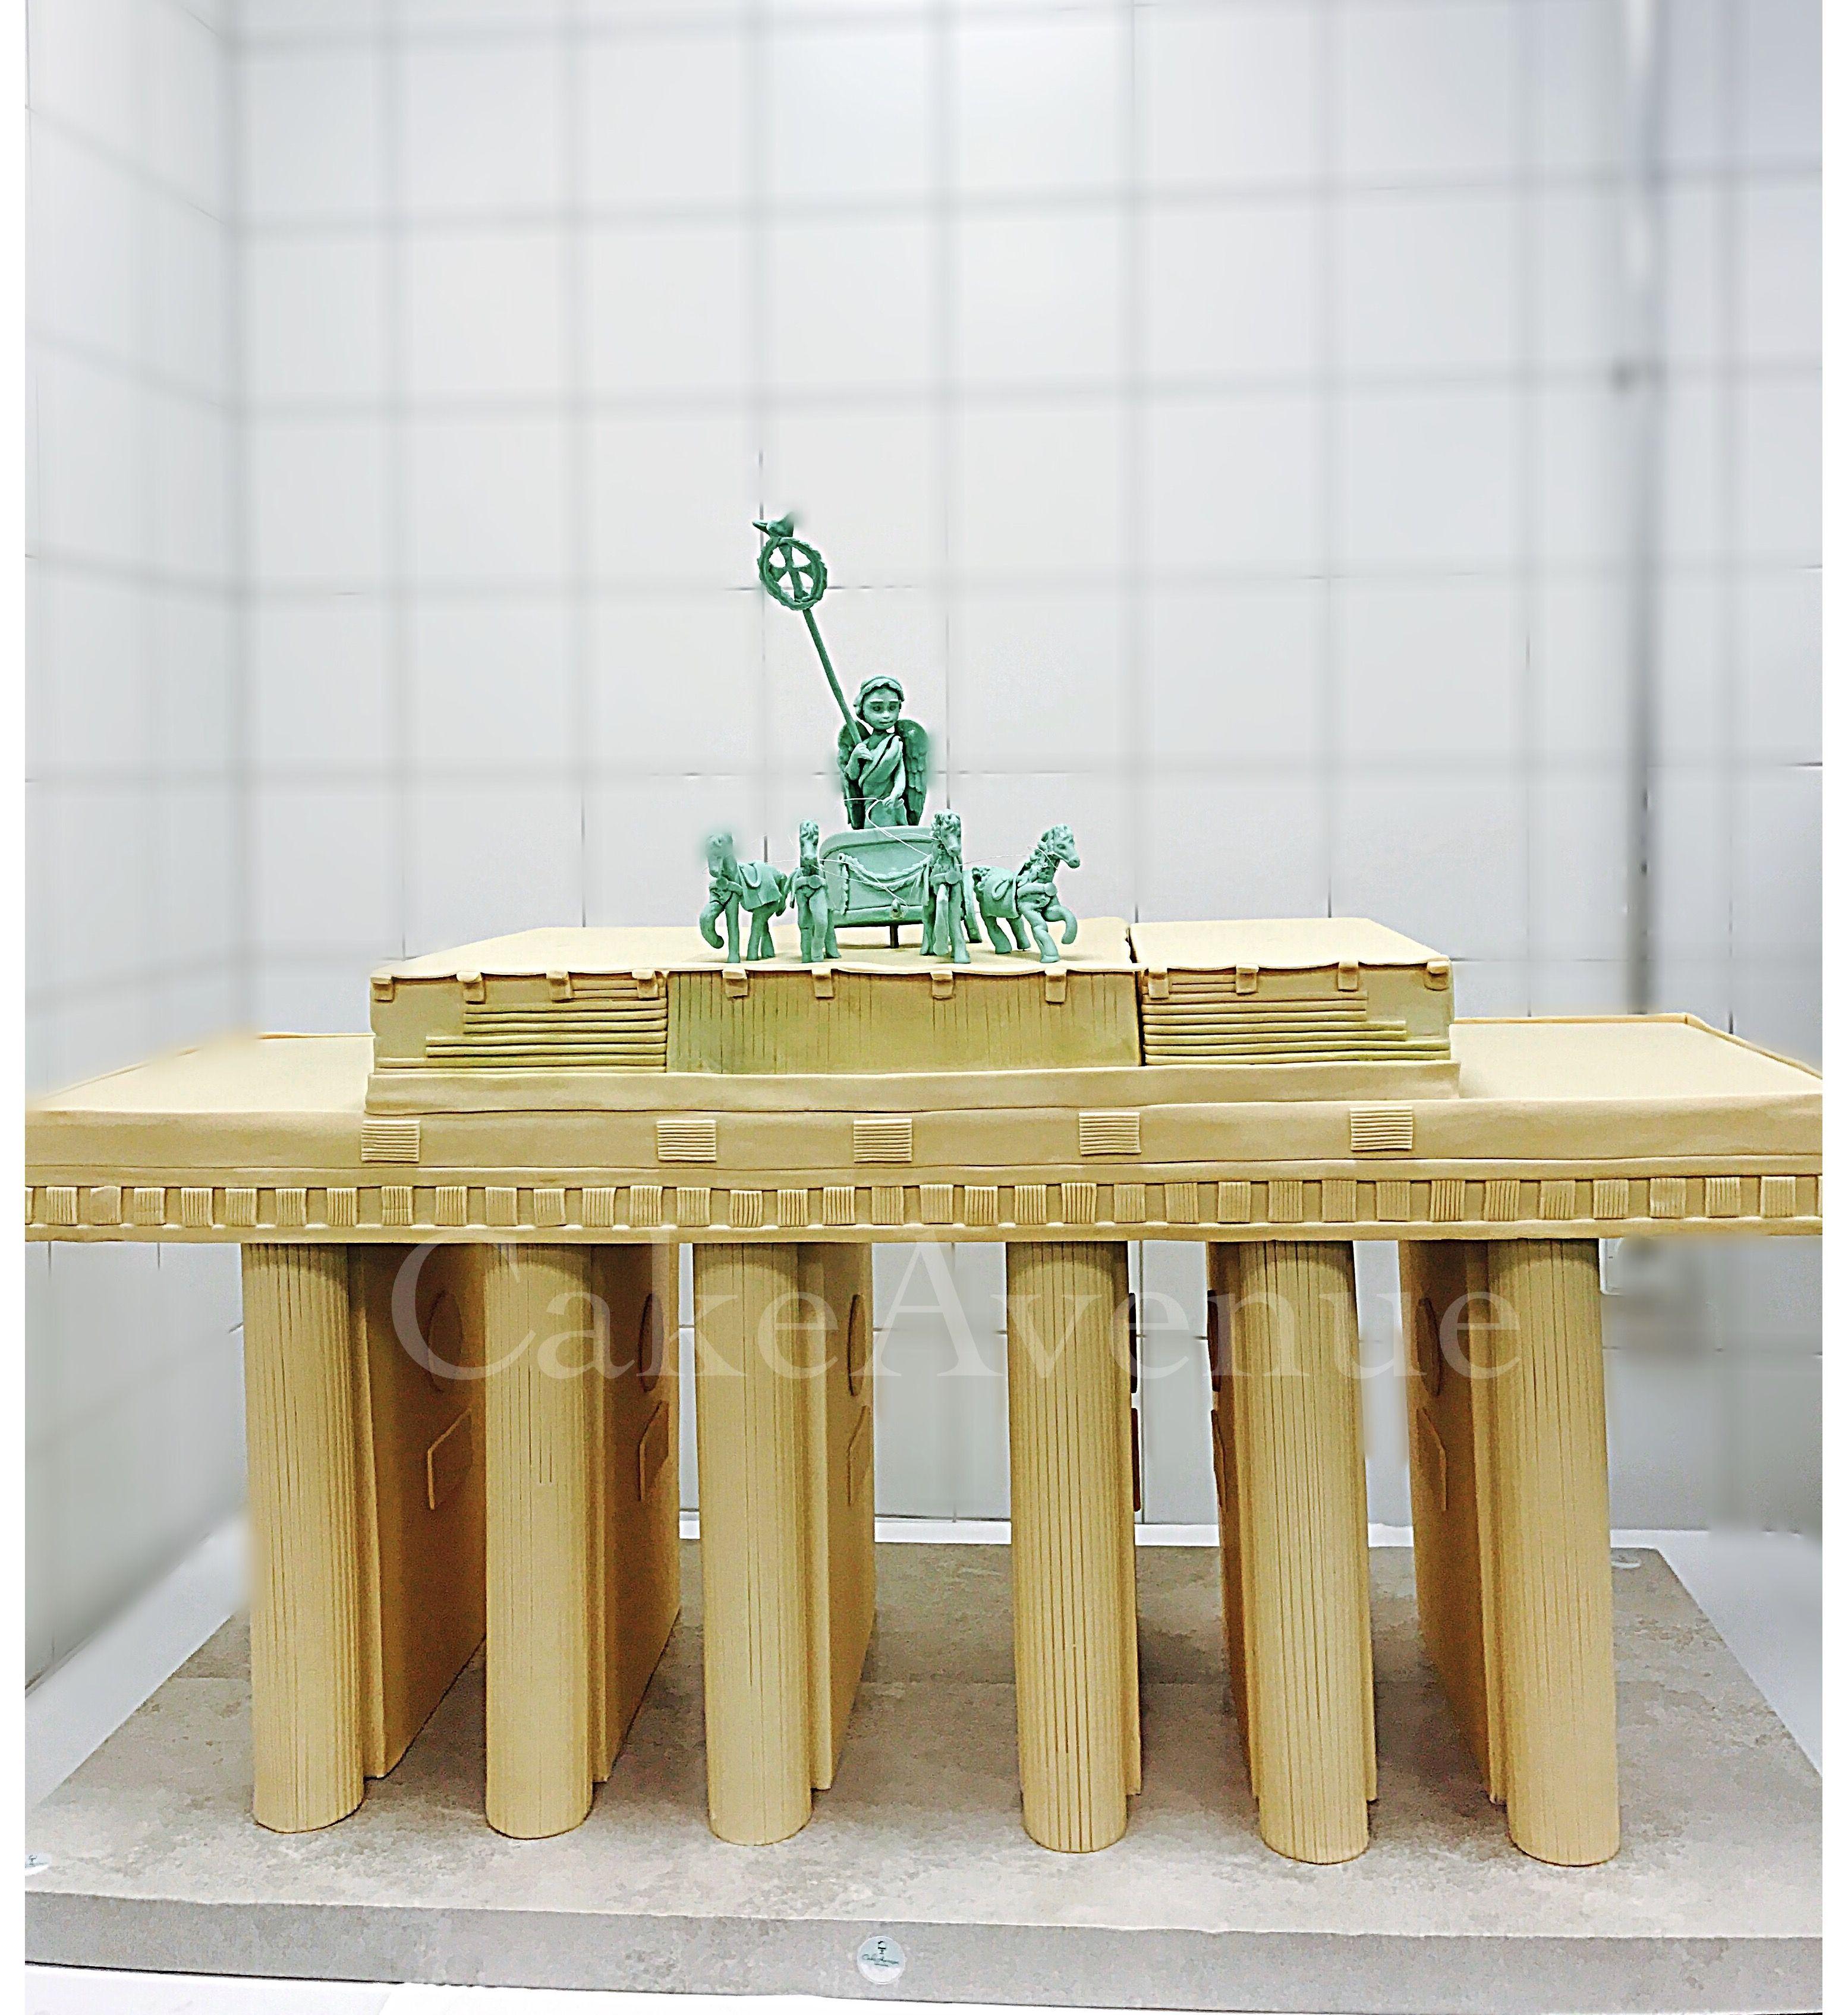 Cake Cakeart Fondant Brandenburger Tor Berlin Brandenburger Tor Berlin Brandenburger Tor Berlin